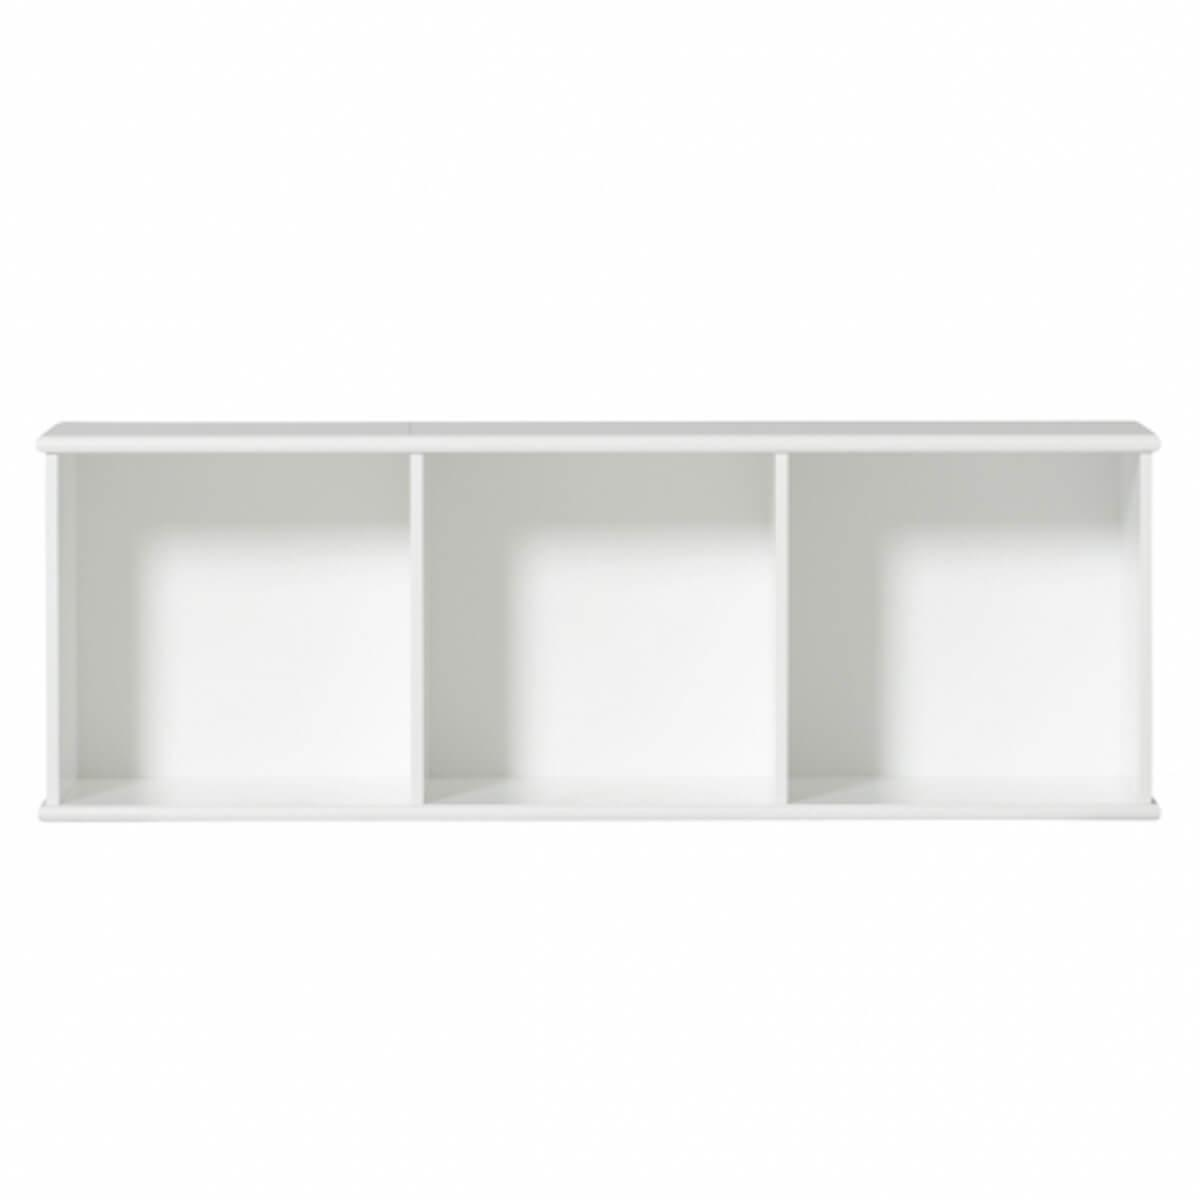 Estantería 106x36cm WOOD Oliver Furniture blanco